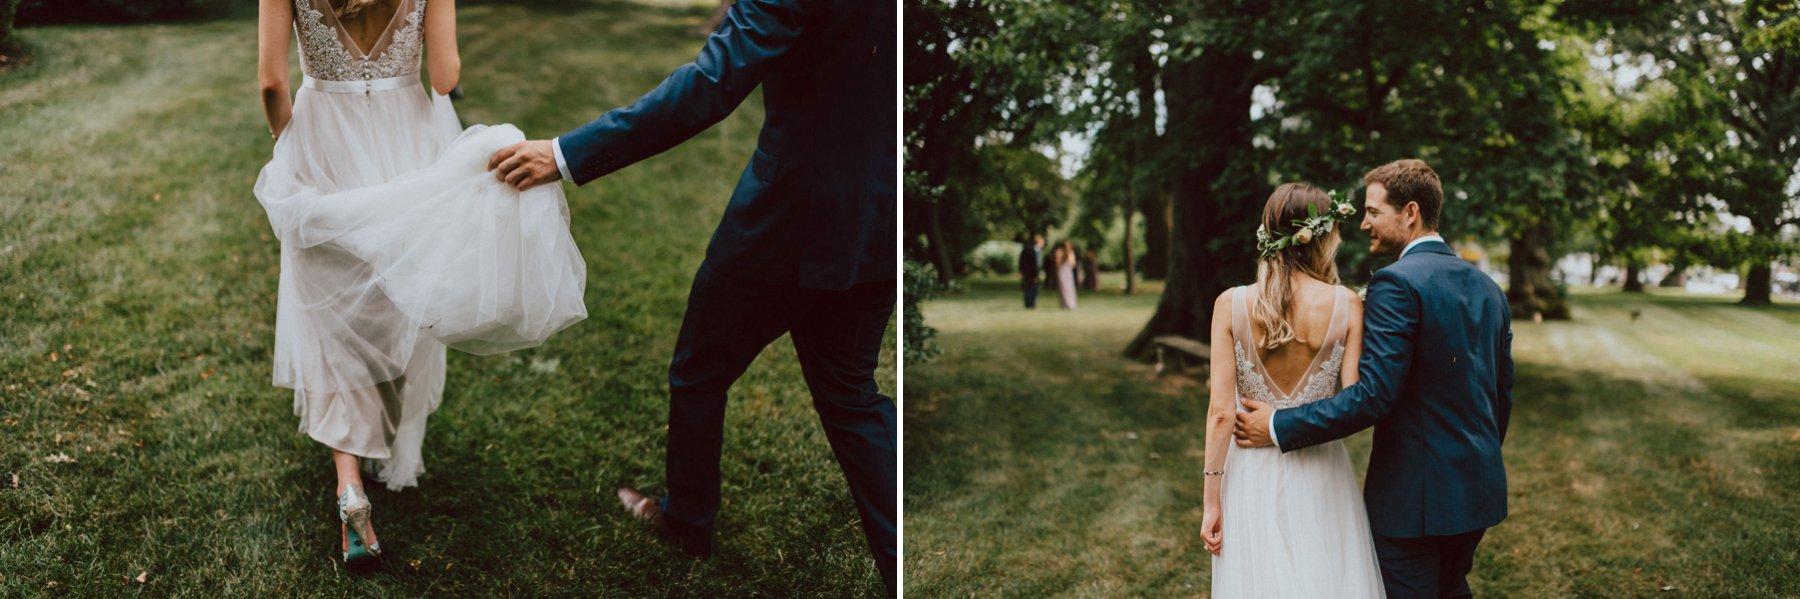 Knowlton-mansion-wedding-64.jpg